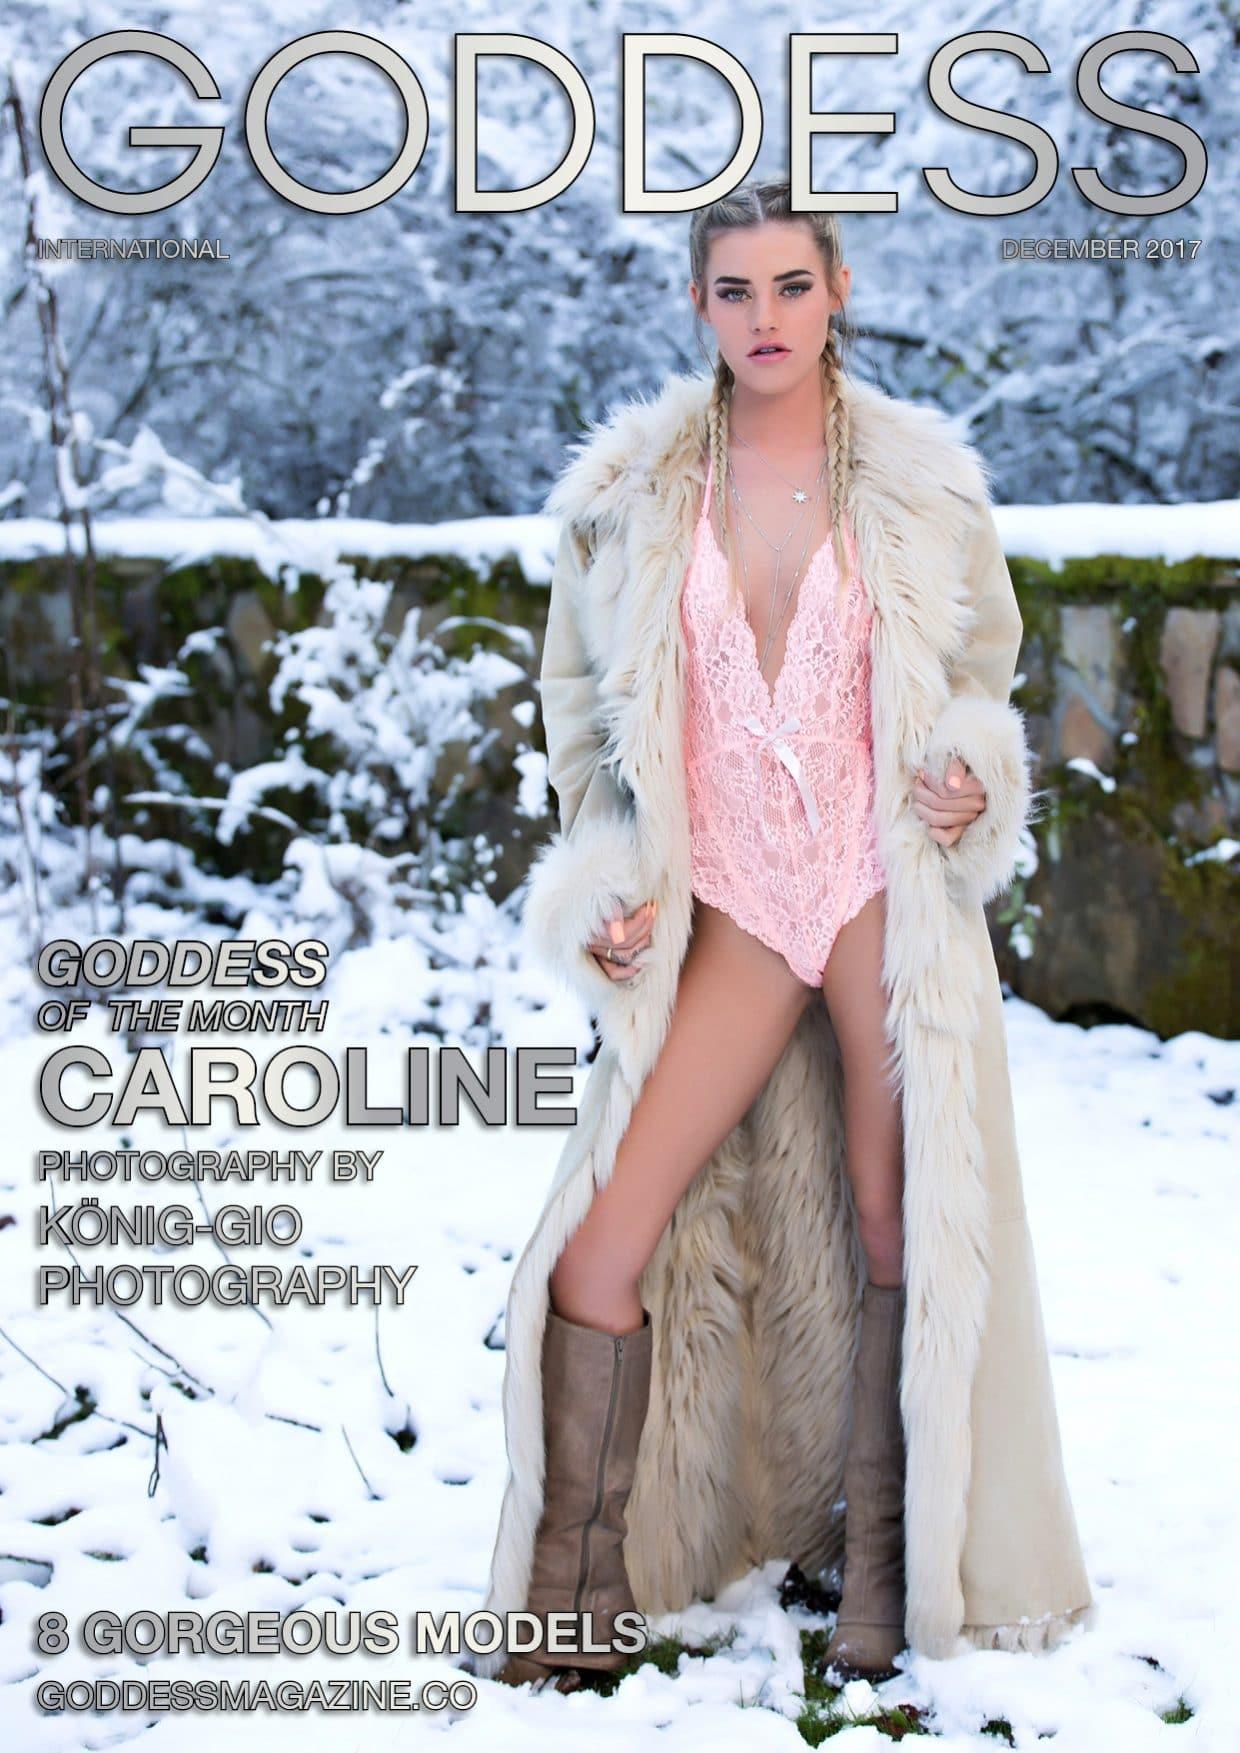 Goddess Magazine - December 2017 - Caroline 1